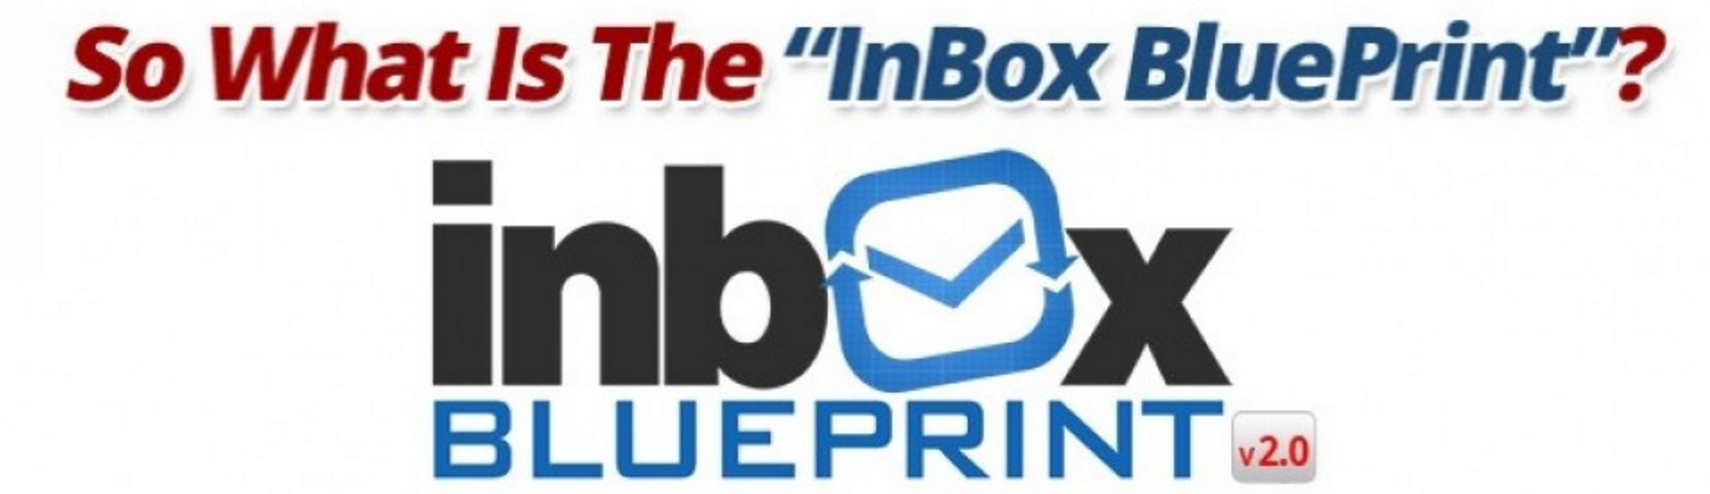 Anik singal inbox blueprint 20 honest review demo email anik singal inbox blueprint 20 honest review demo email marketing training program malvernweather Image collections